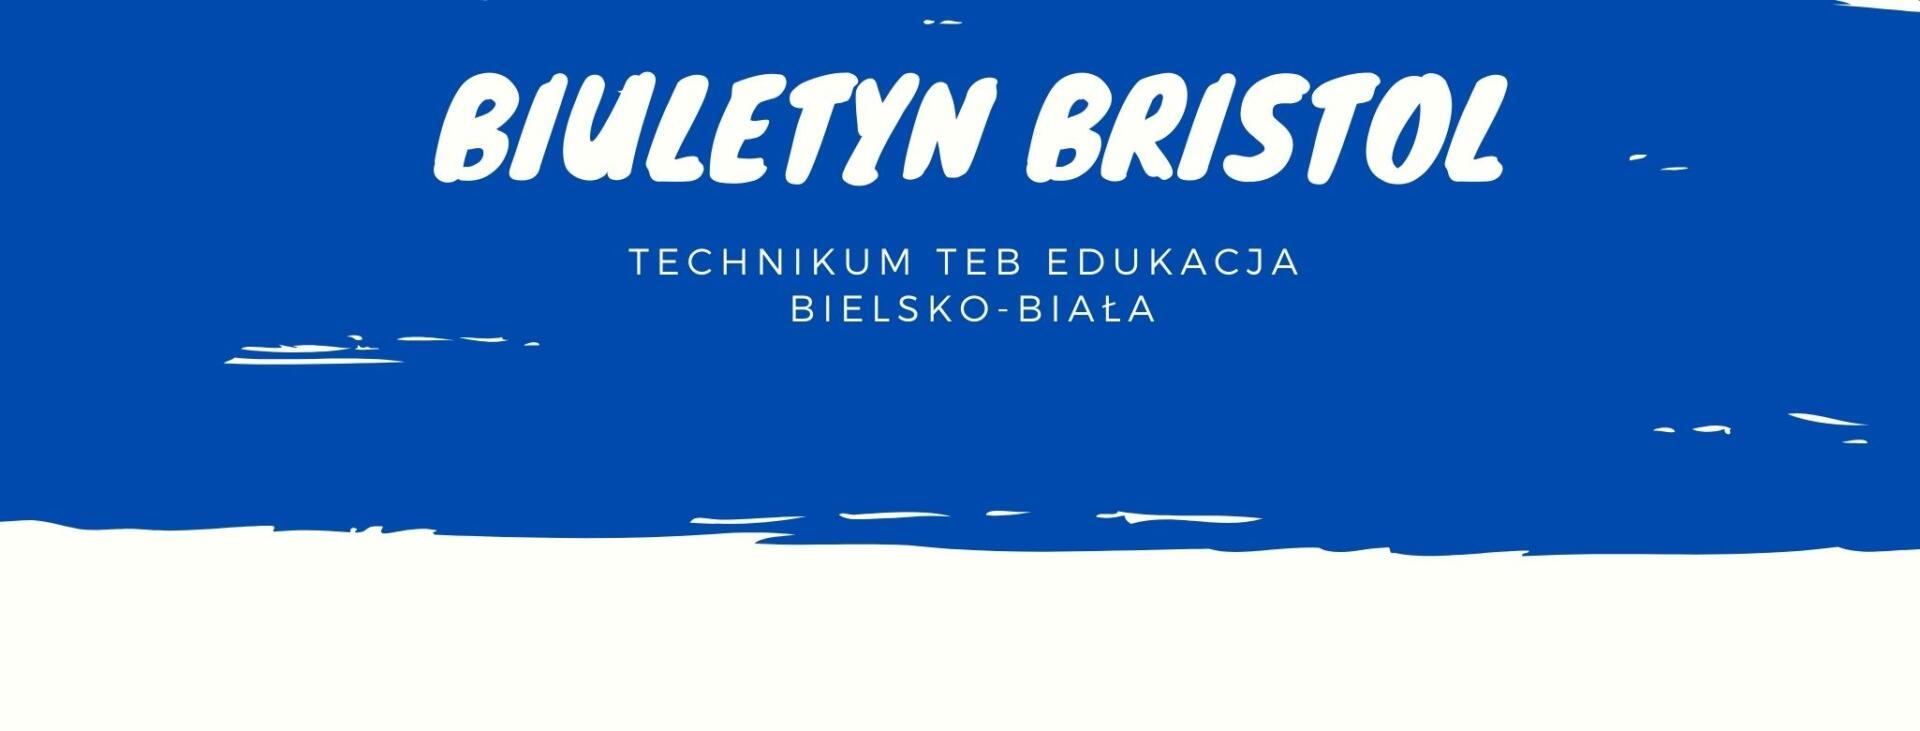 Biuletyn Brystol